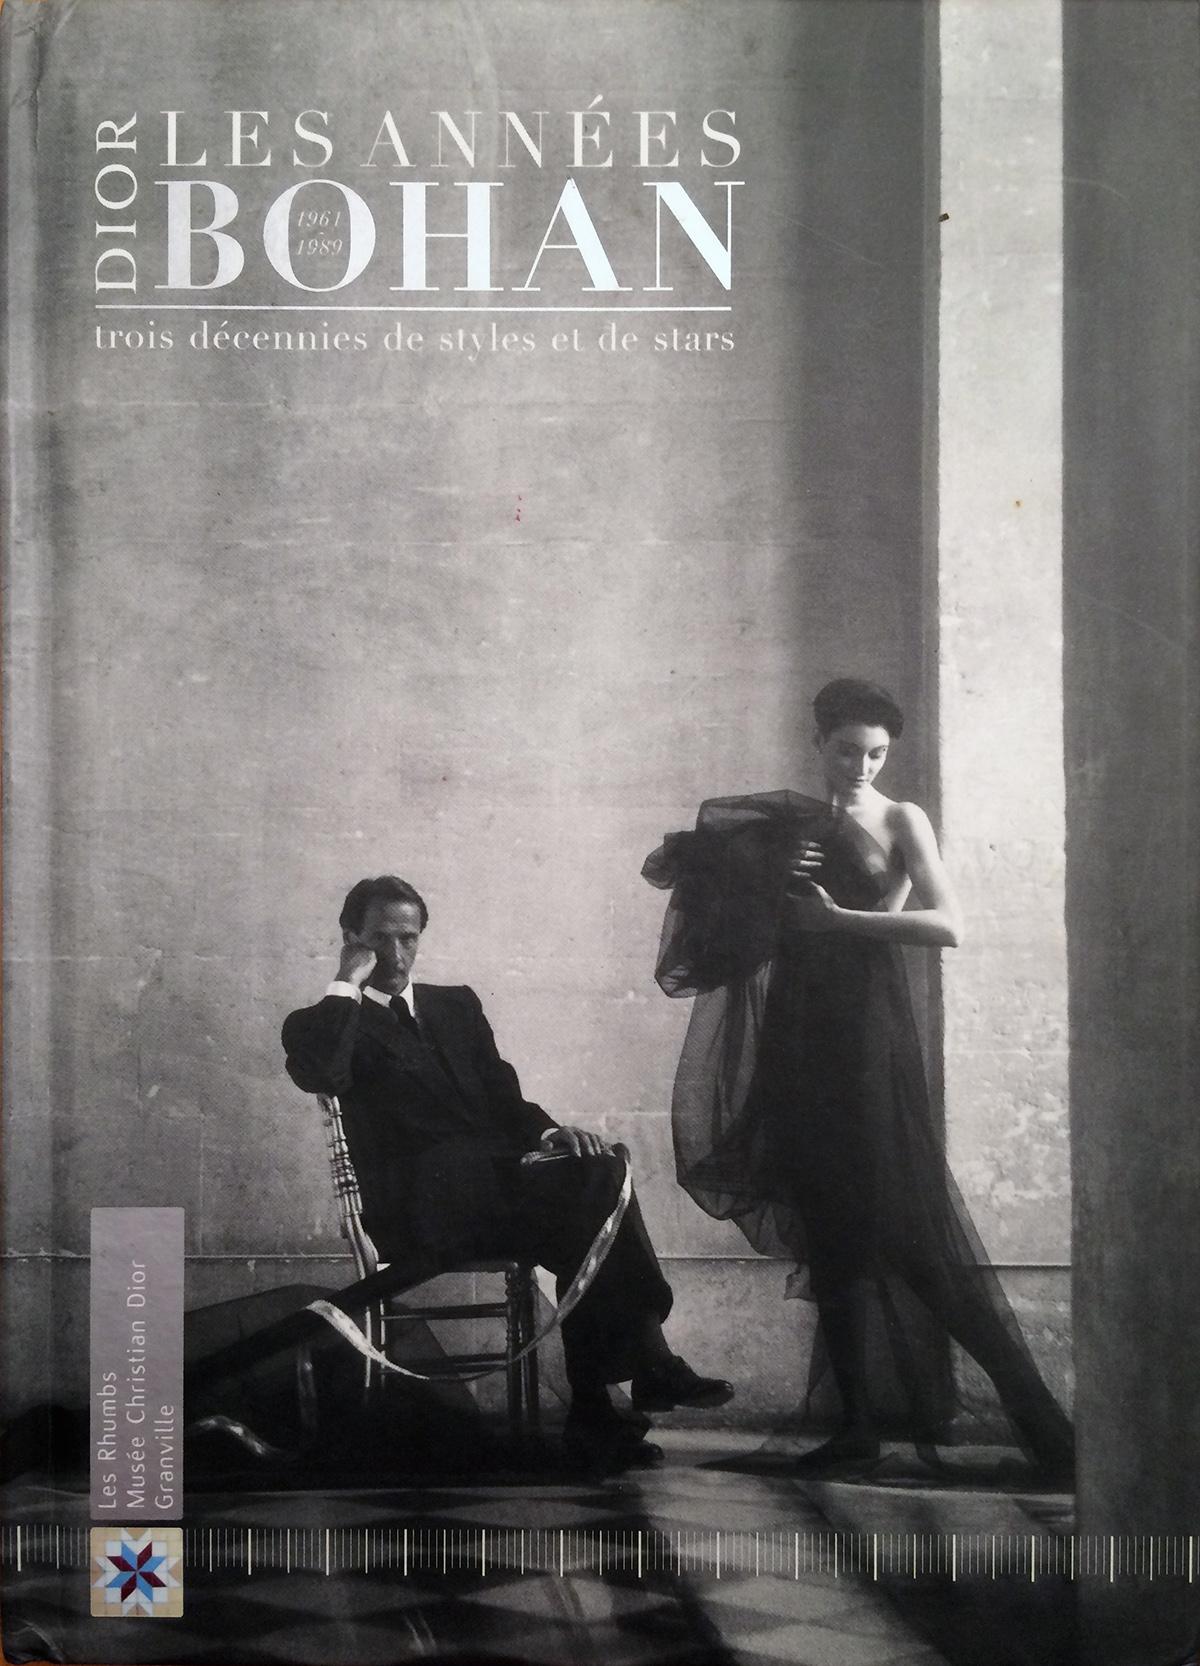 Dior, Les années Bohan 1961-1989